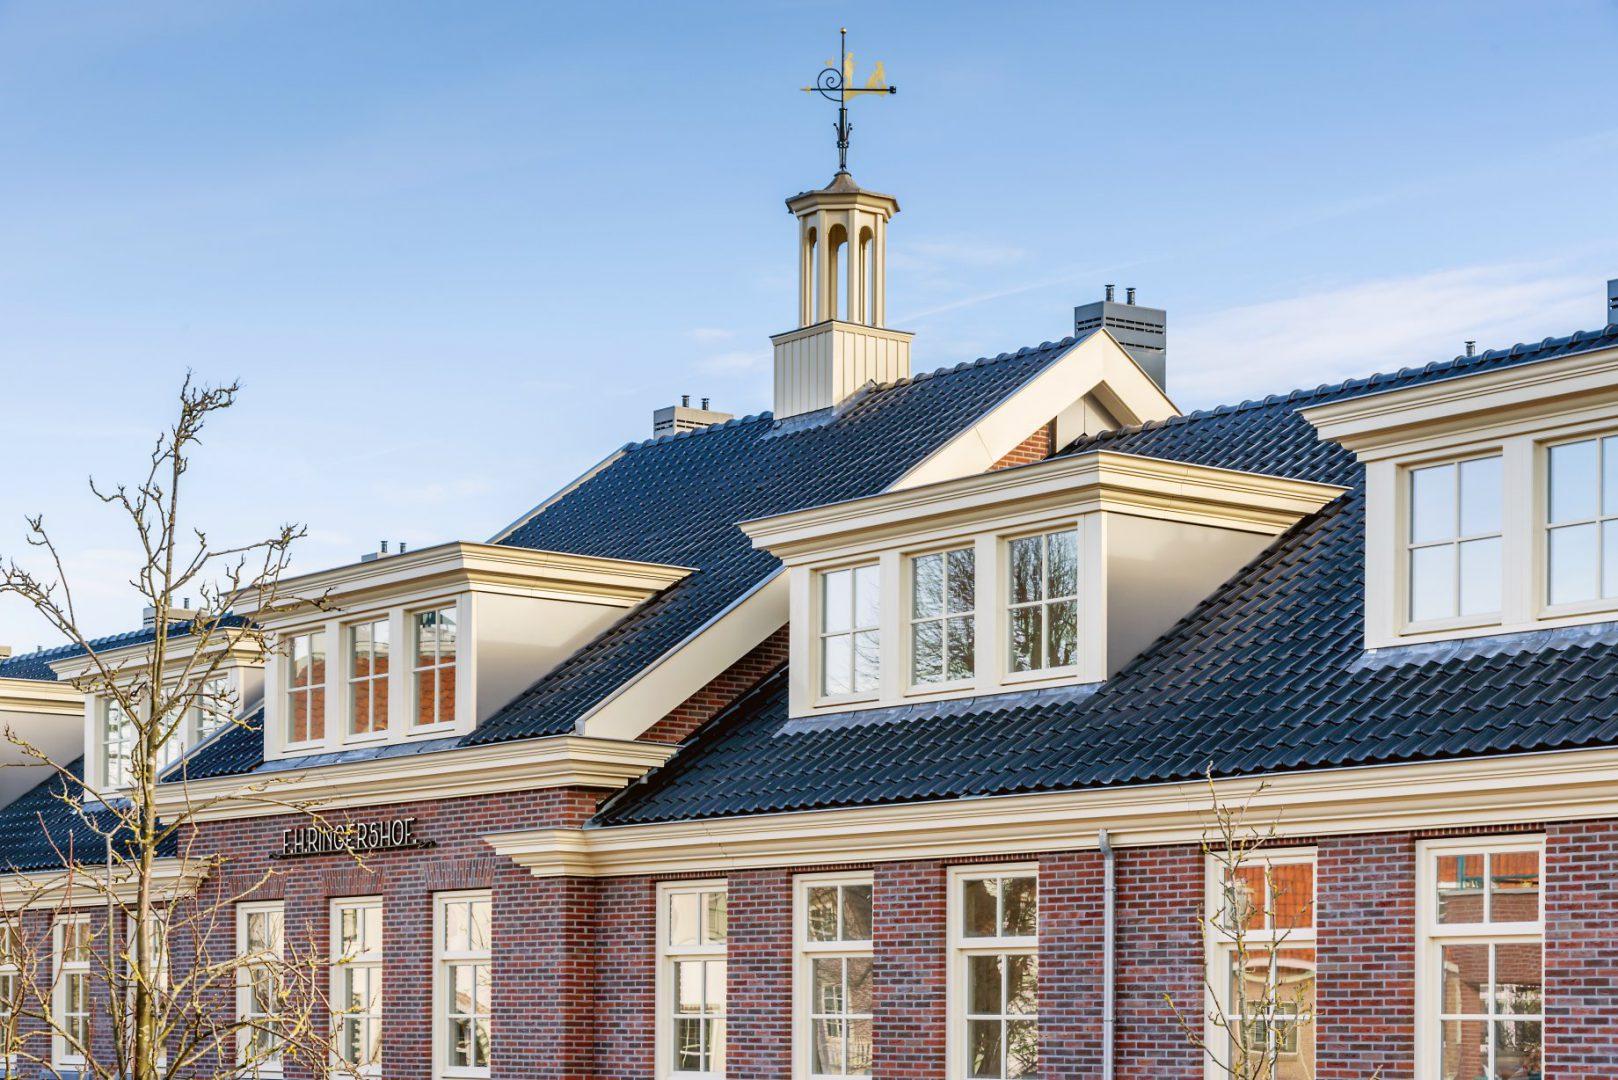 Ringershof-renovatie-ZIJLSTRA-SCHIPPER-architecten-architectenbureau-noord-holland-architect-007